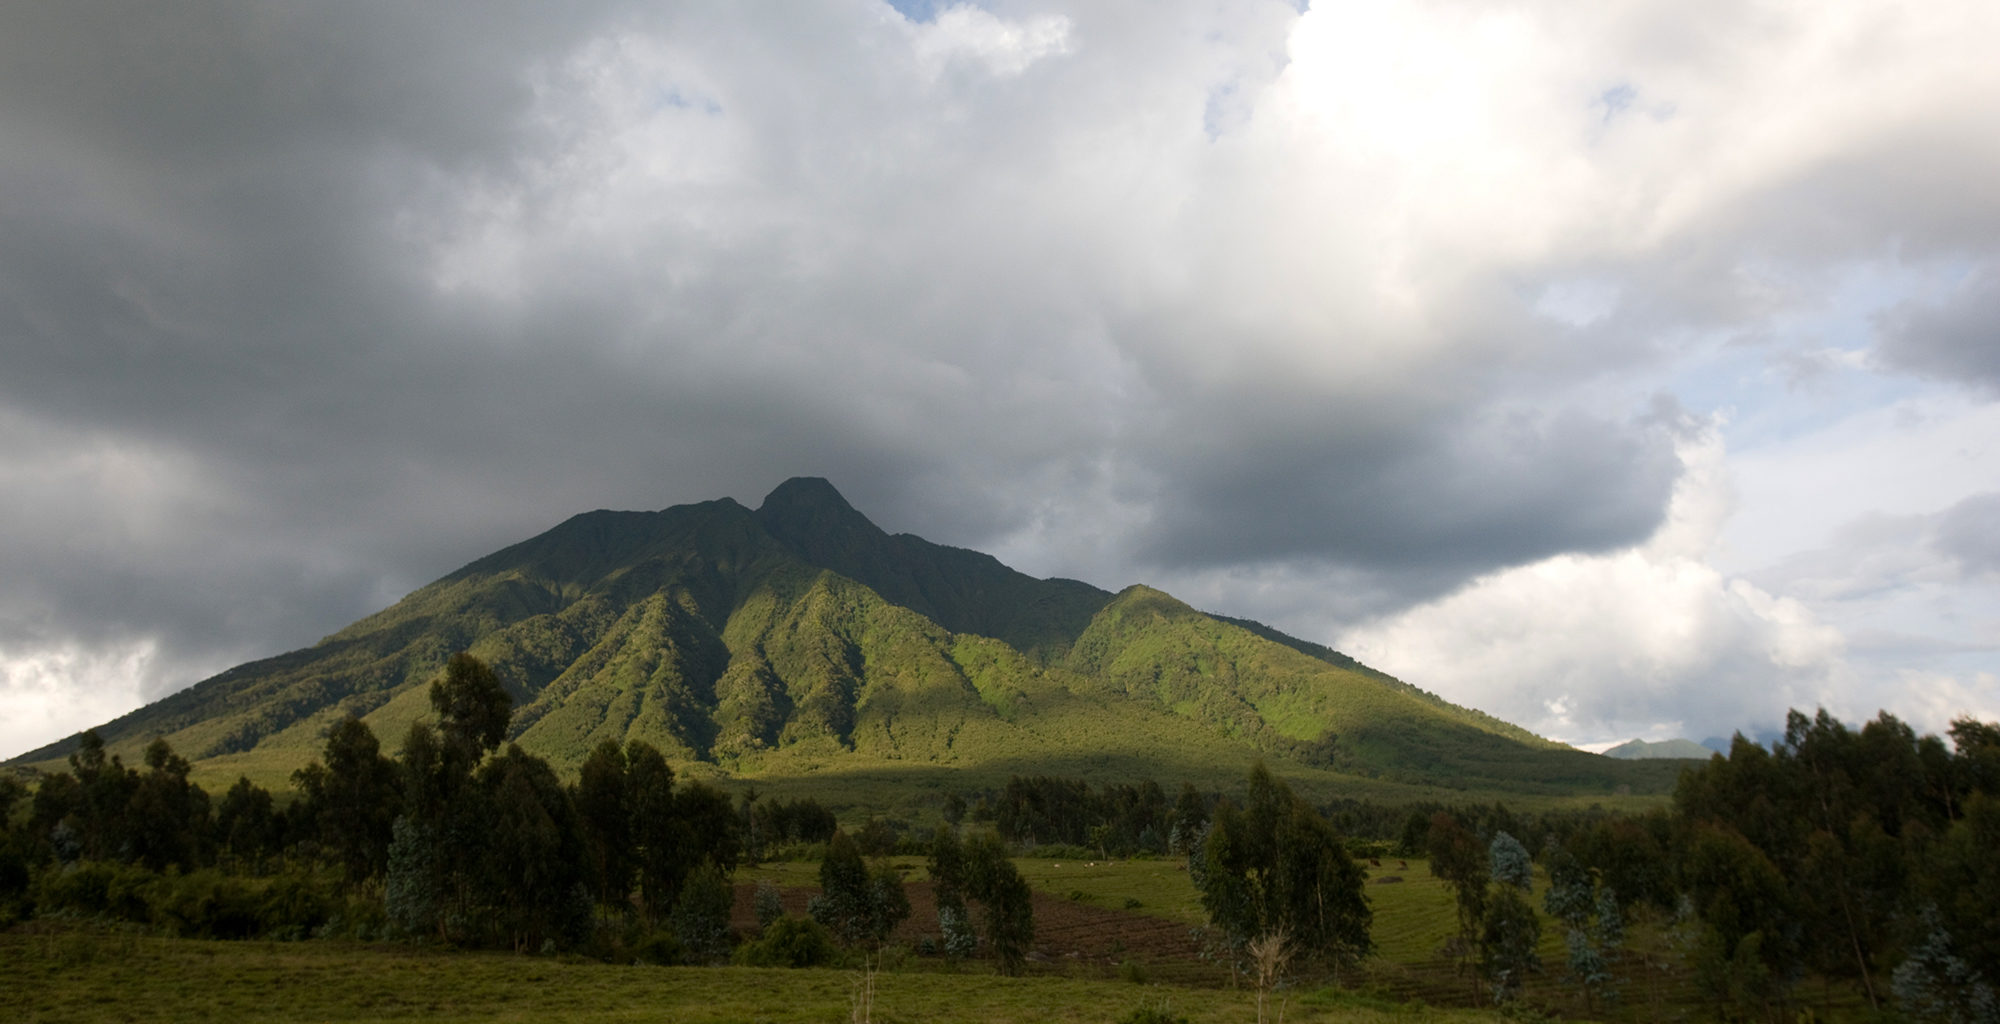 Rwanda-Volcanoes-National-Park-Landscape